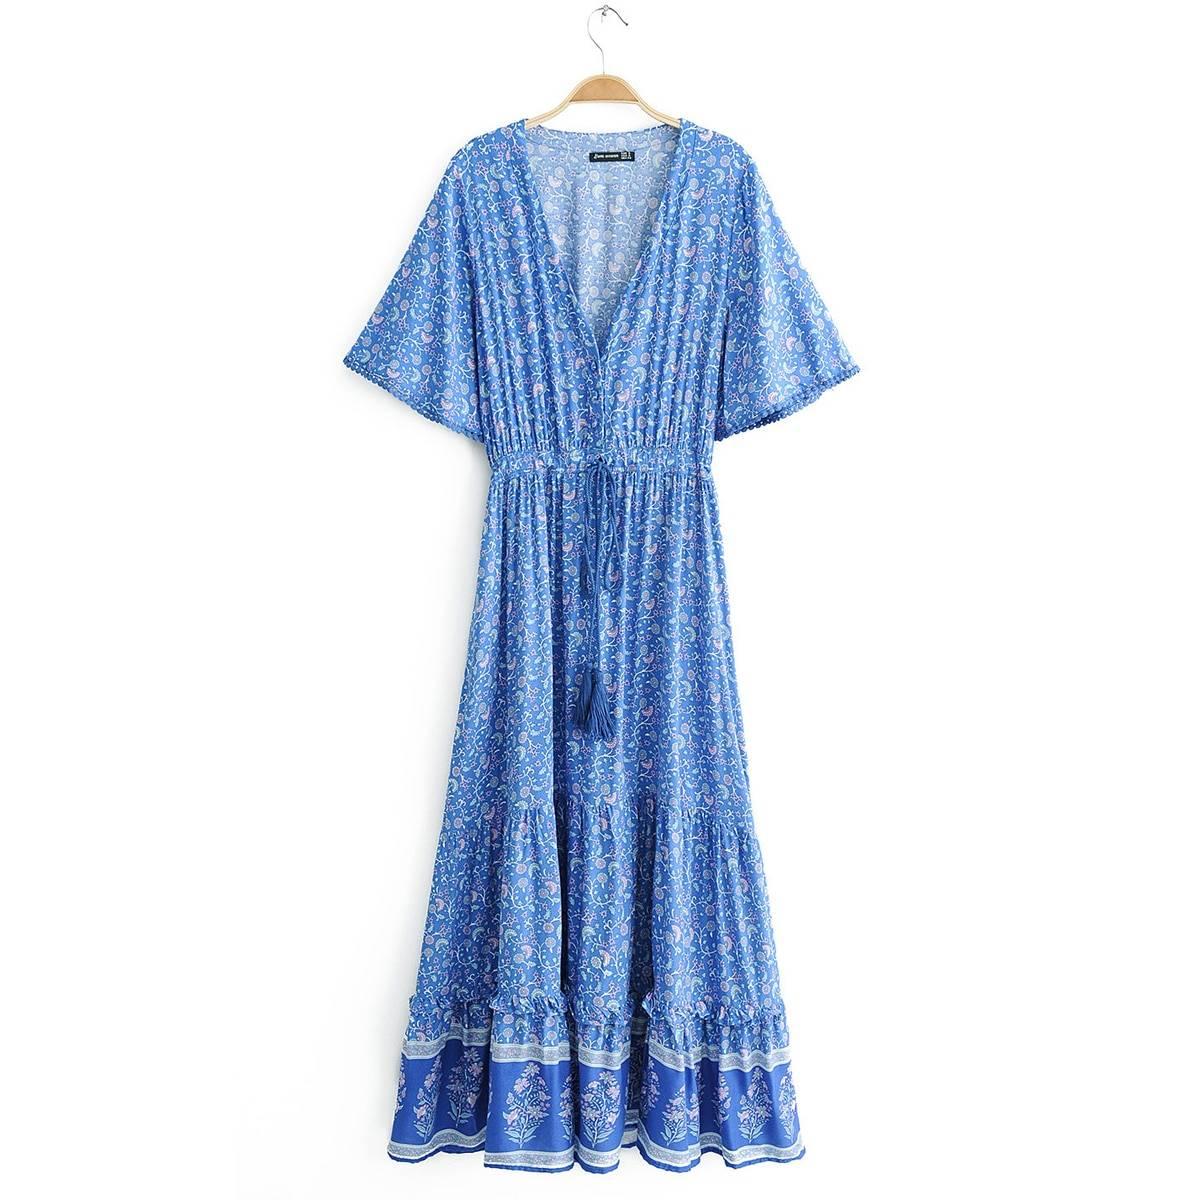 Vintage print waist boho v-neck short sleeve maxi dress